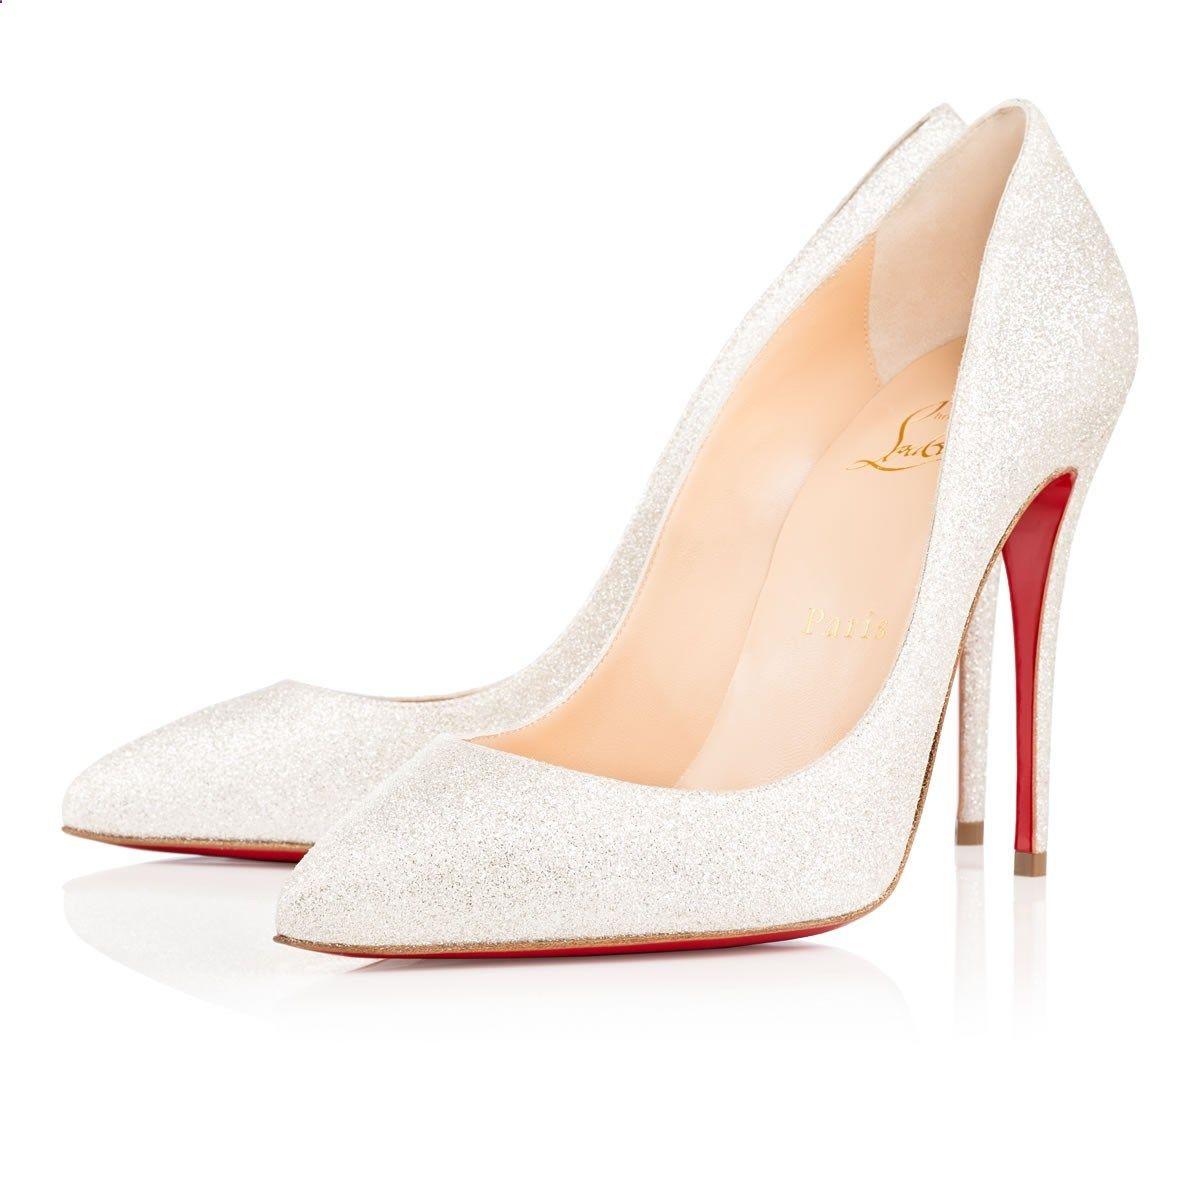 ff6860481252 Pigalle Follies 100 Ivory Glitter - Women Shoes - Christian Louboutin